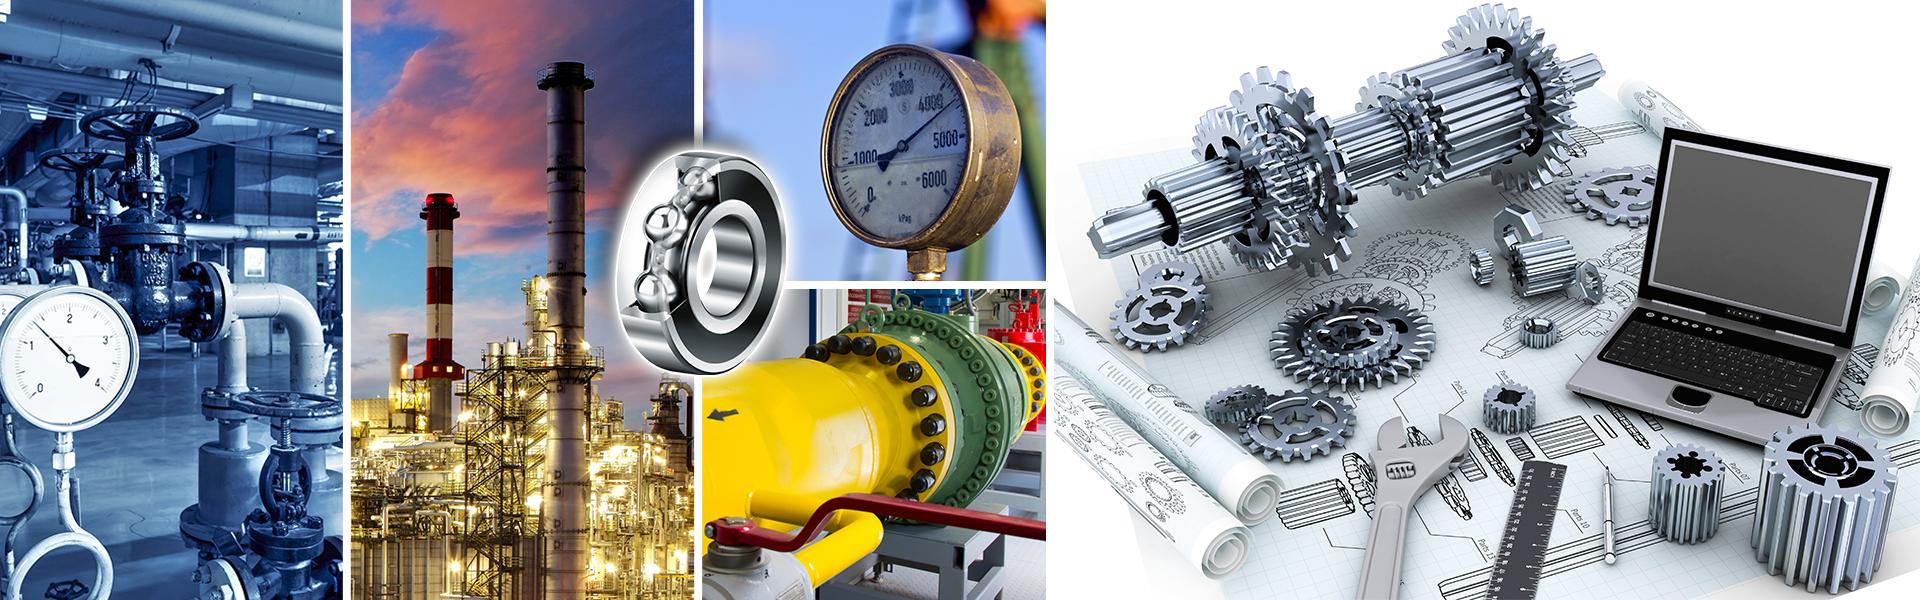 Industrial Solutions - Ultrasonic Leak Detectors PlantScan